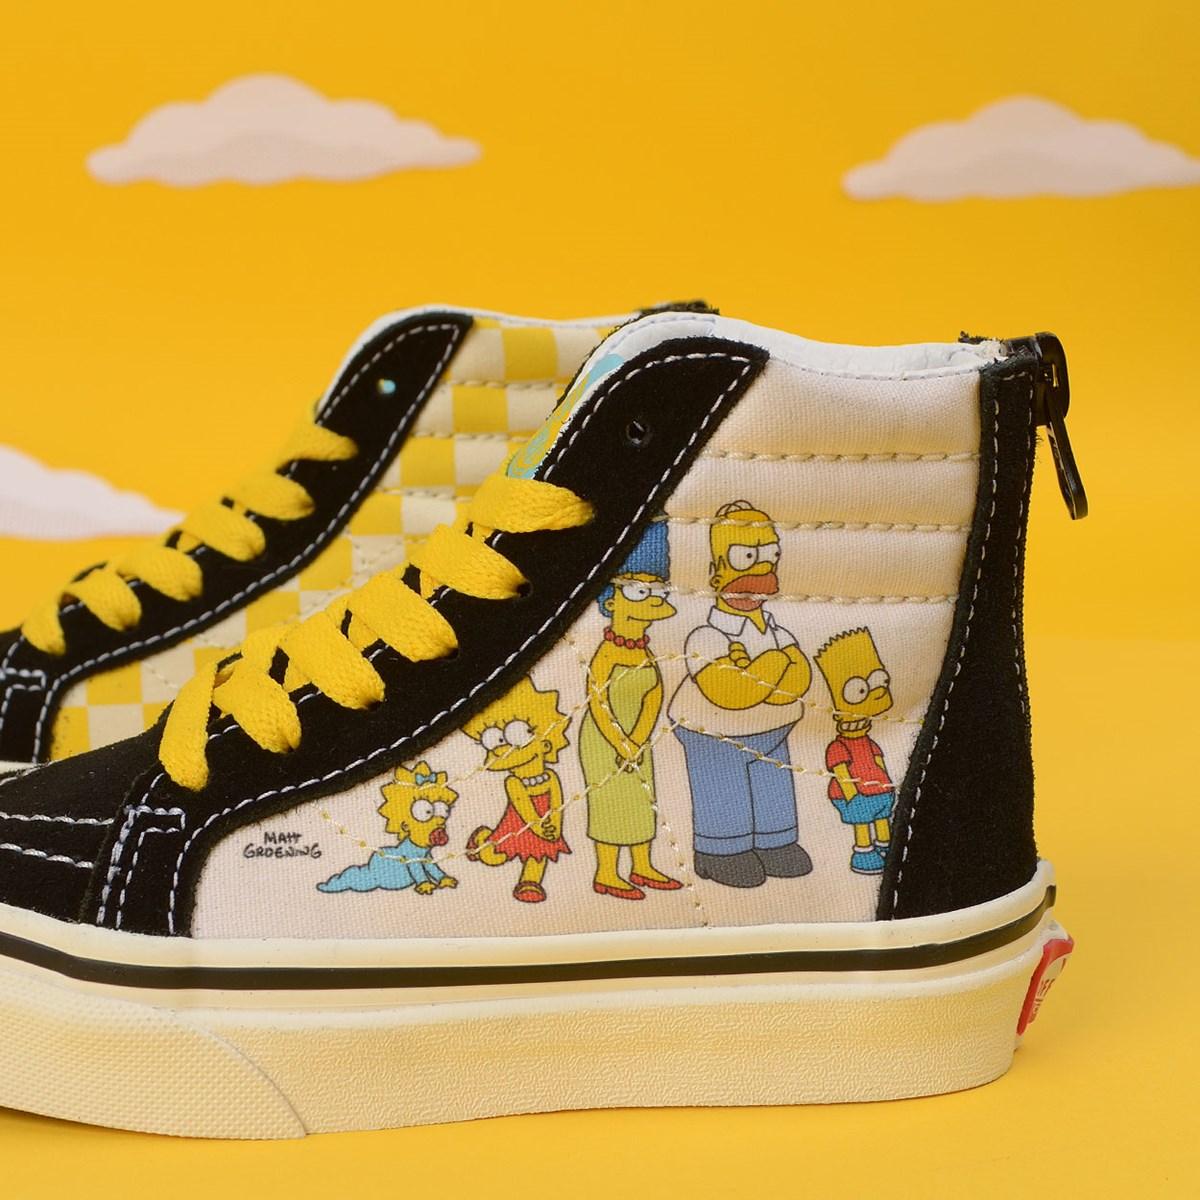 Tênis Vans The Simpsons Sk8 Hi Kids Zip 1987 - 2020 Black White VN0A4BUX17E